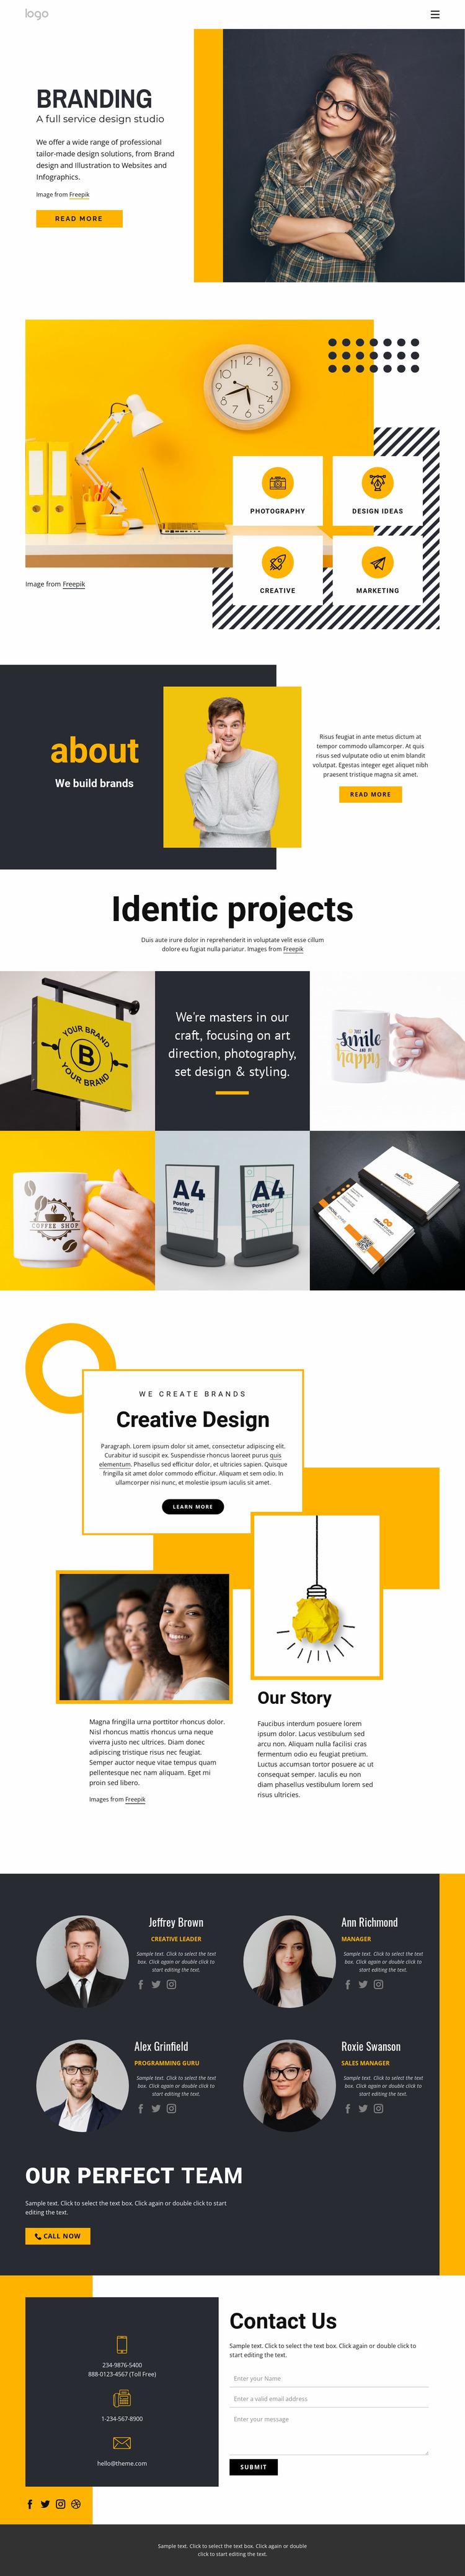 Full-service design studio Website Mockup